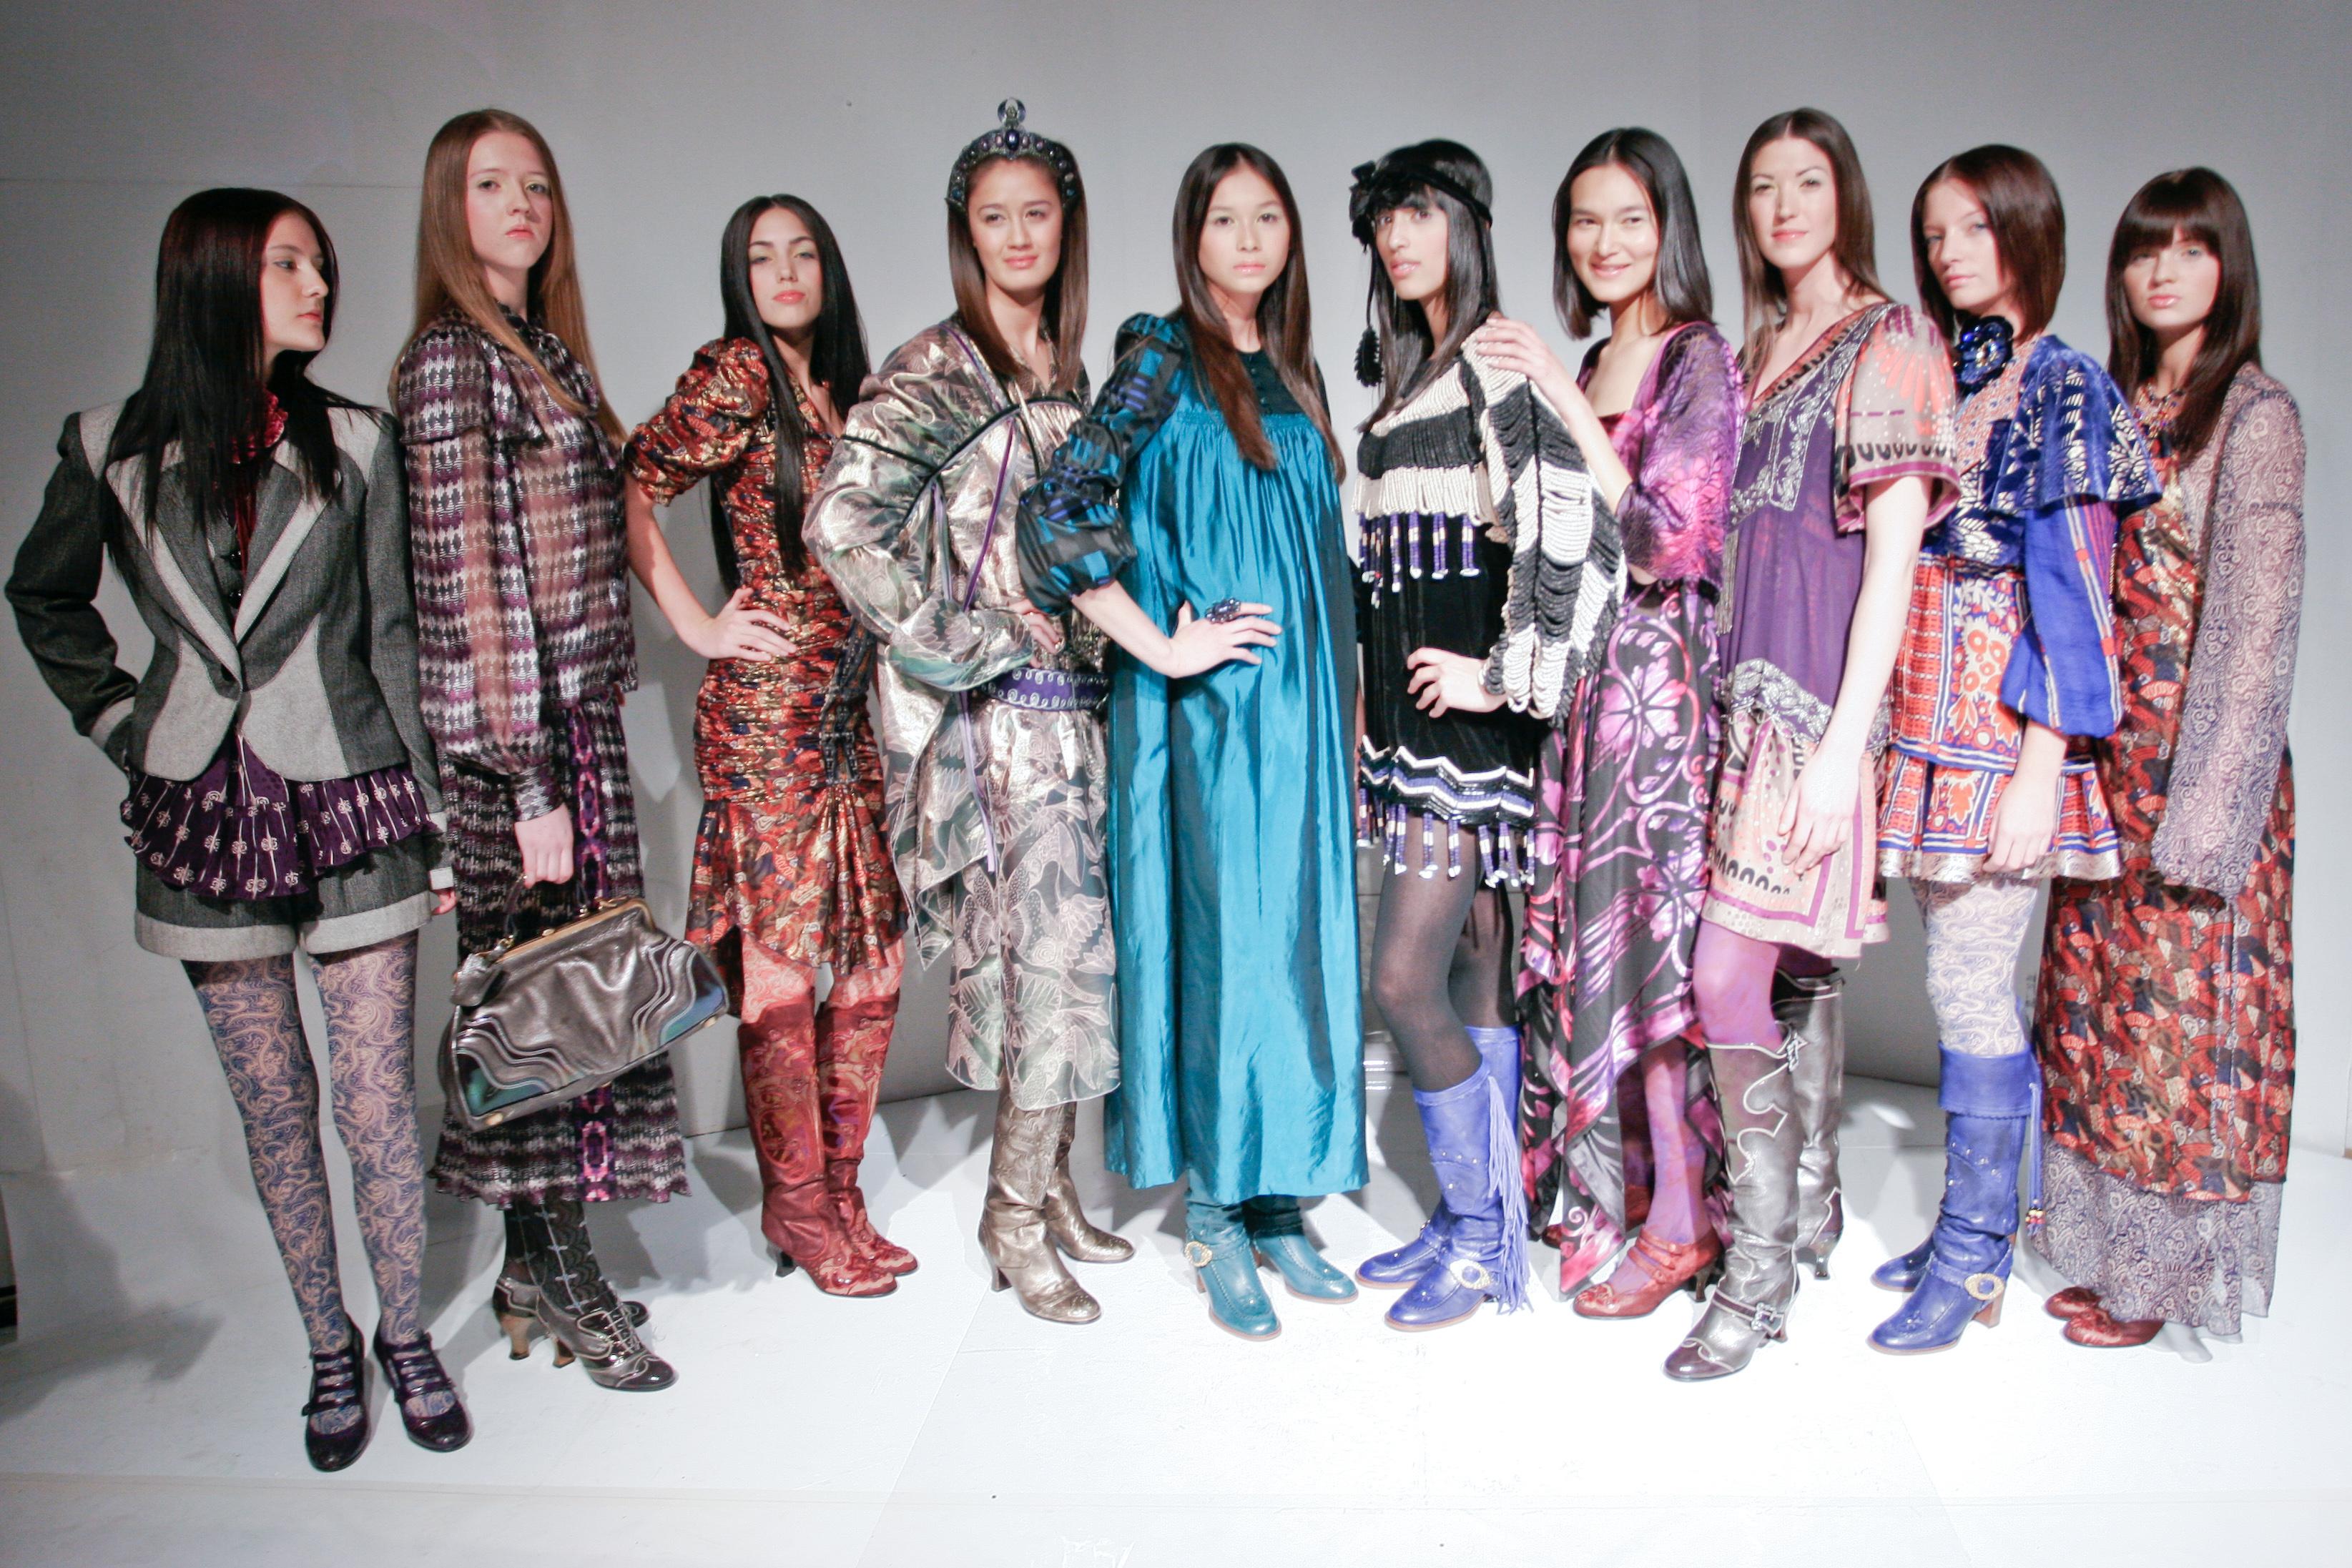 Http Www Fashion Berlin Eu De Synthetik Elastische Kleider Hosenqualitaet